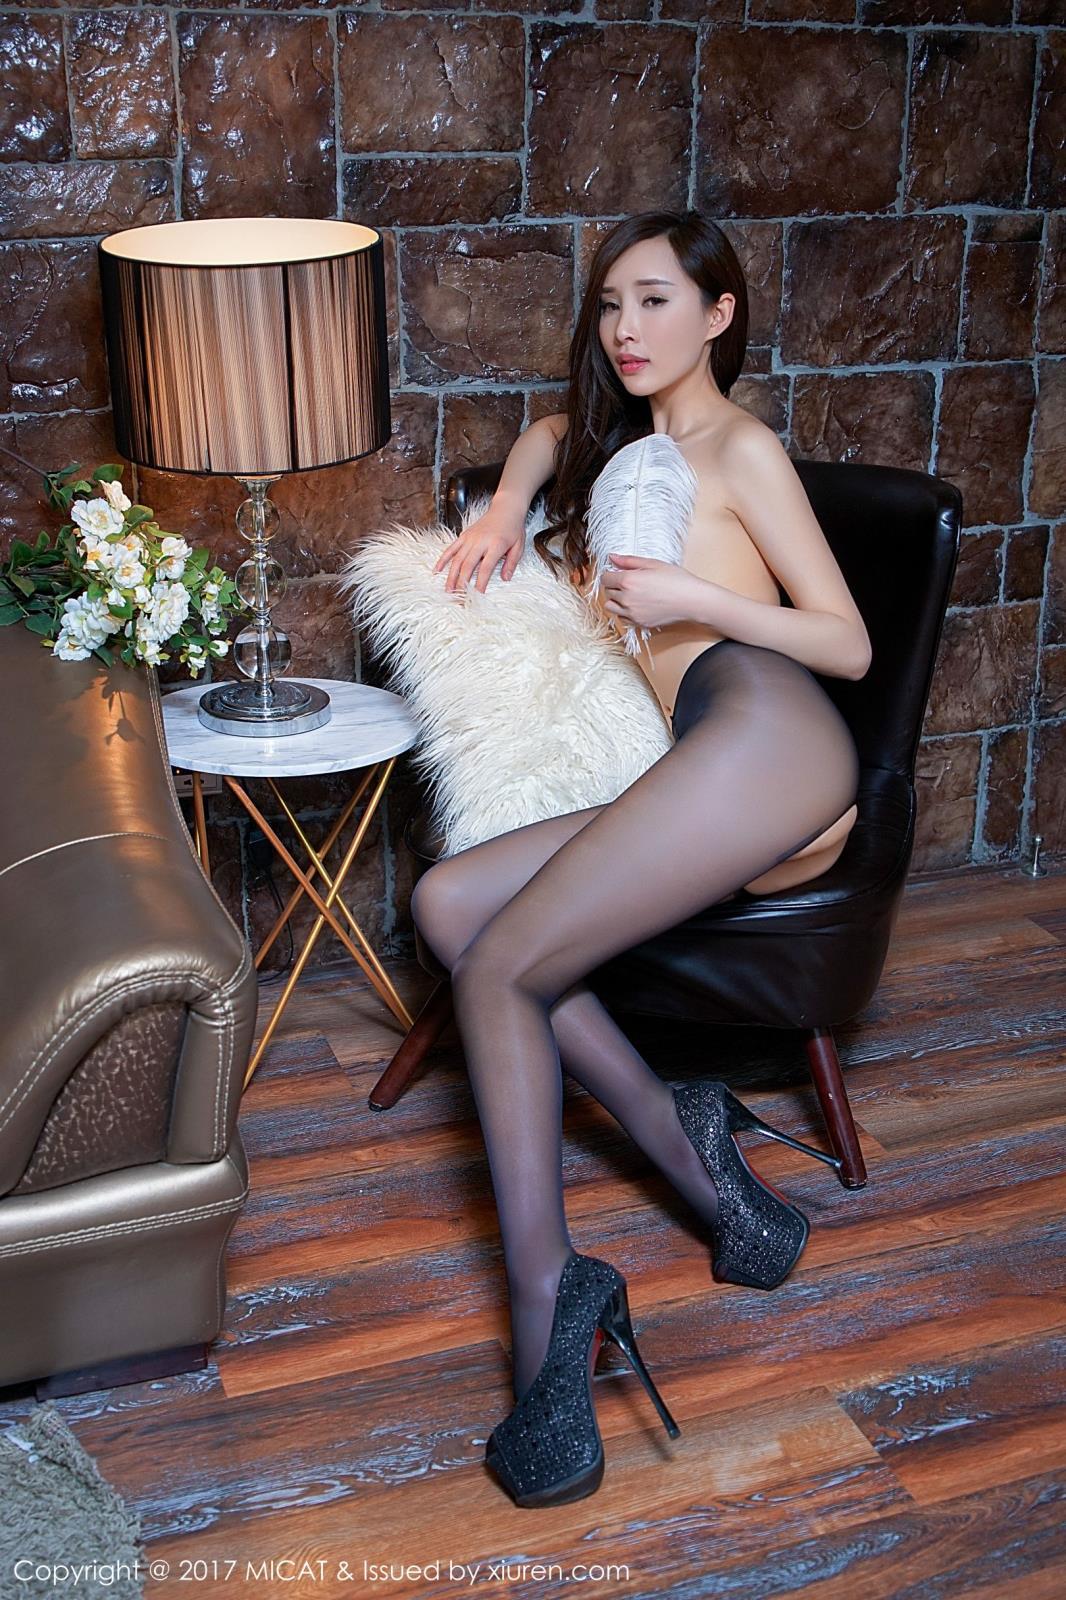 [MICAT猫萌榜] 宅男女神周妍希土肥圆矮挫穷丝袜美腿内衣诱惑写真